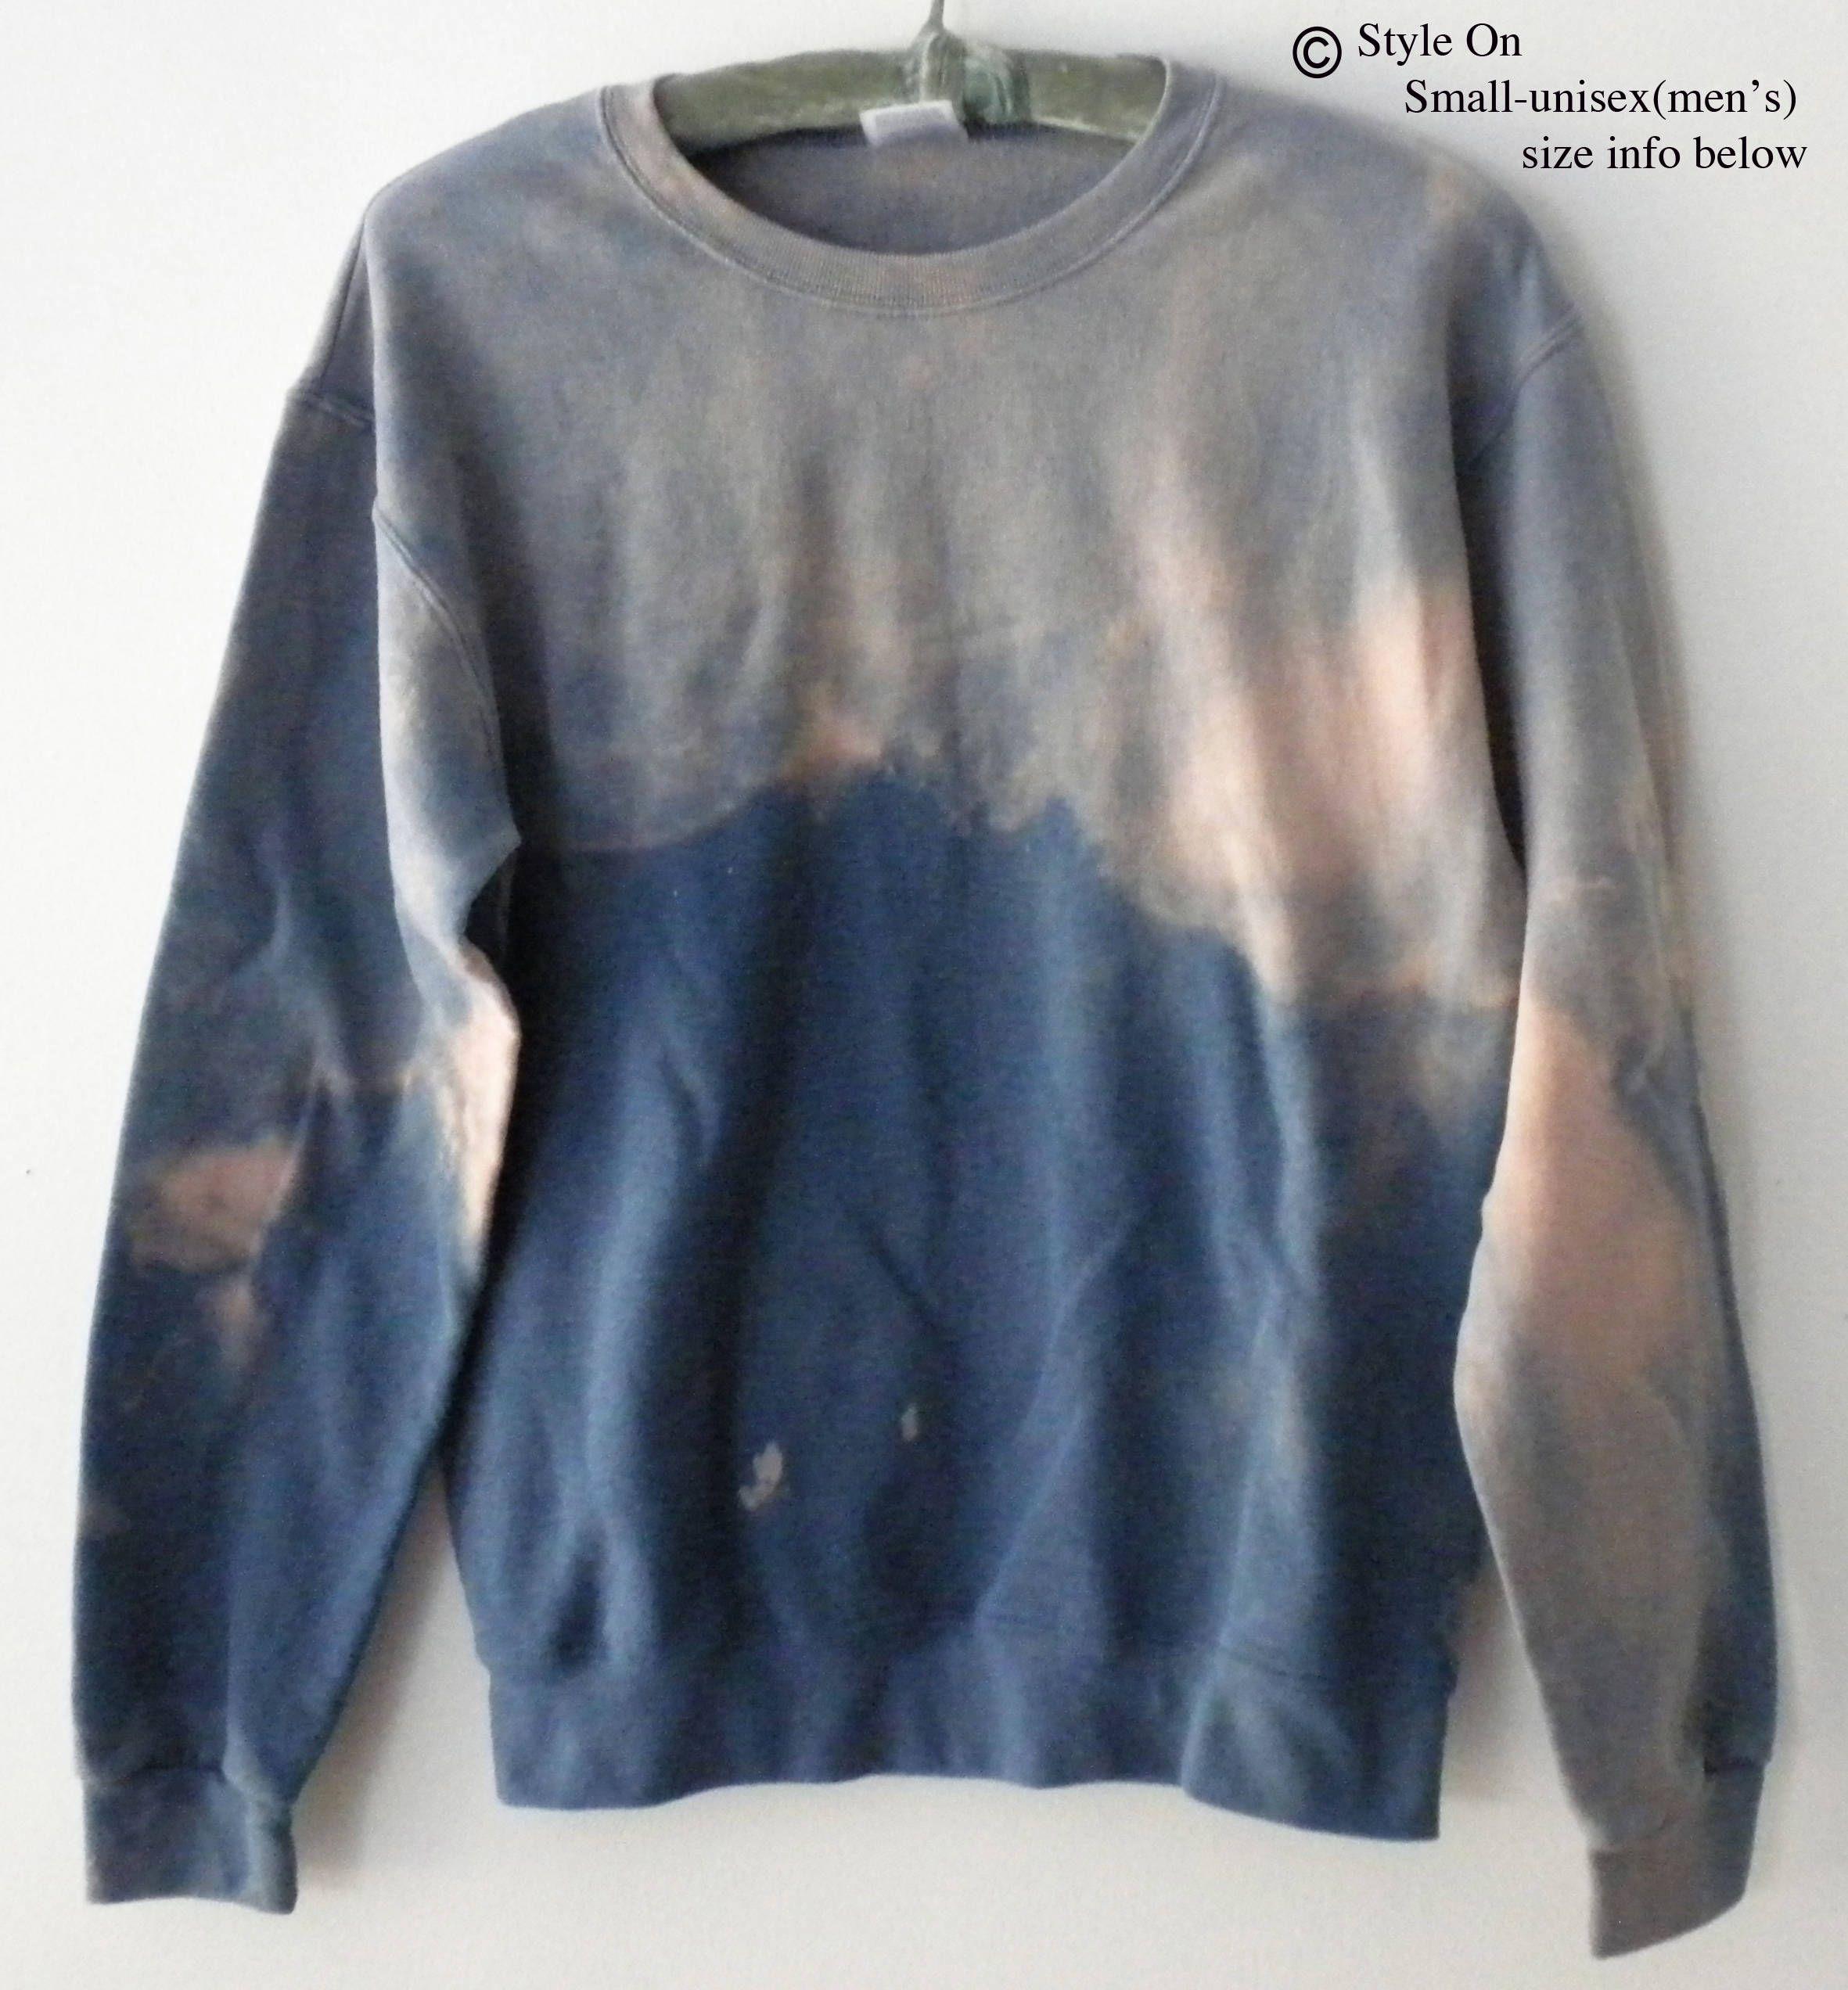 Blue crewneck sweatshirt, dip dyed sweatshirt, ombre sweater, Boho, jumper, sweater, Rocker sweatshirt, acid wash, tie dye, pink, retro